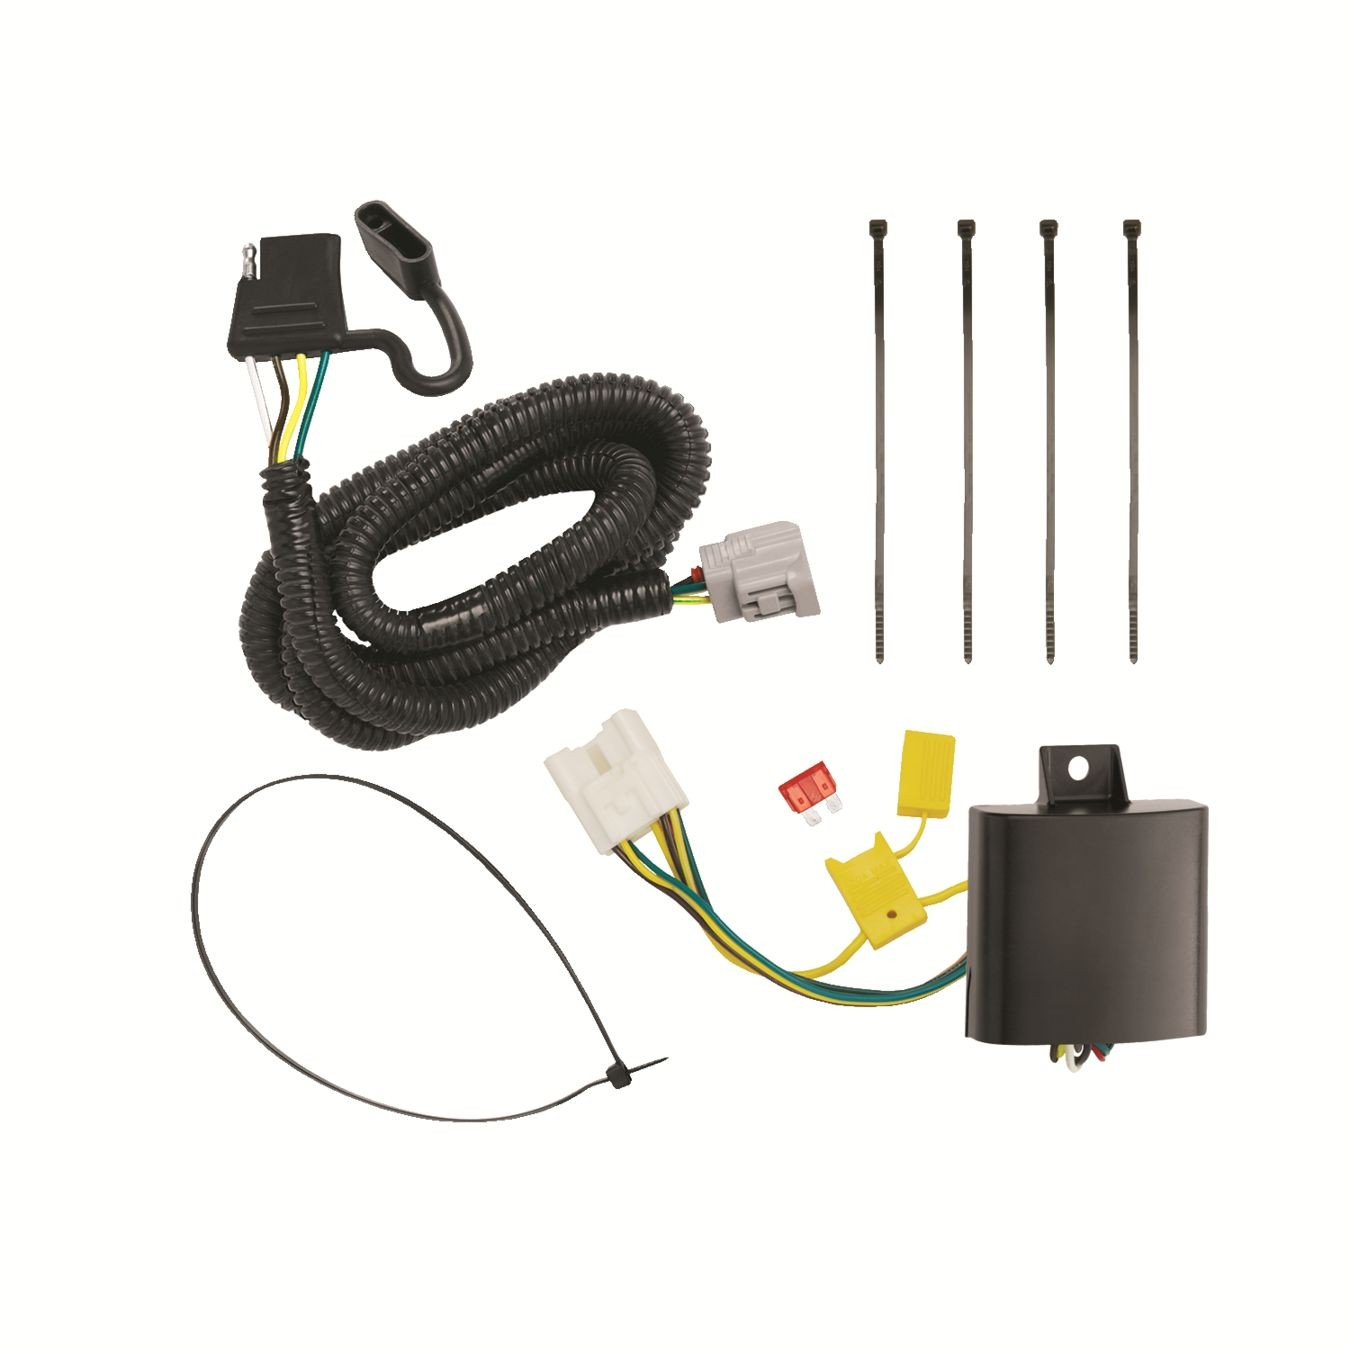 Tekonsha 118255 Tow Harness Harnesses Wiring